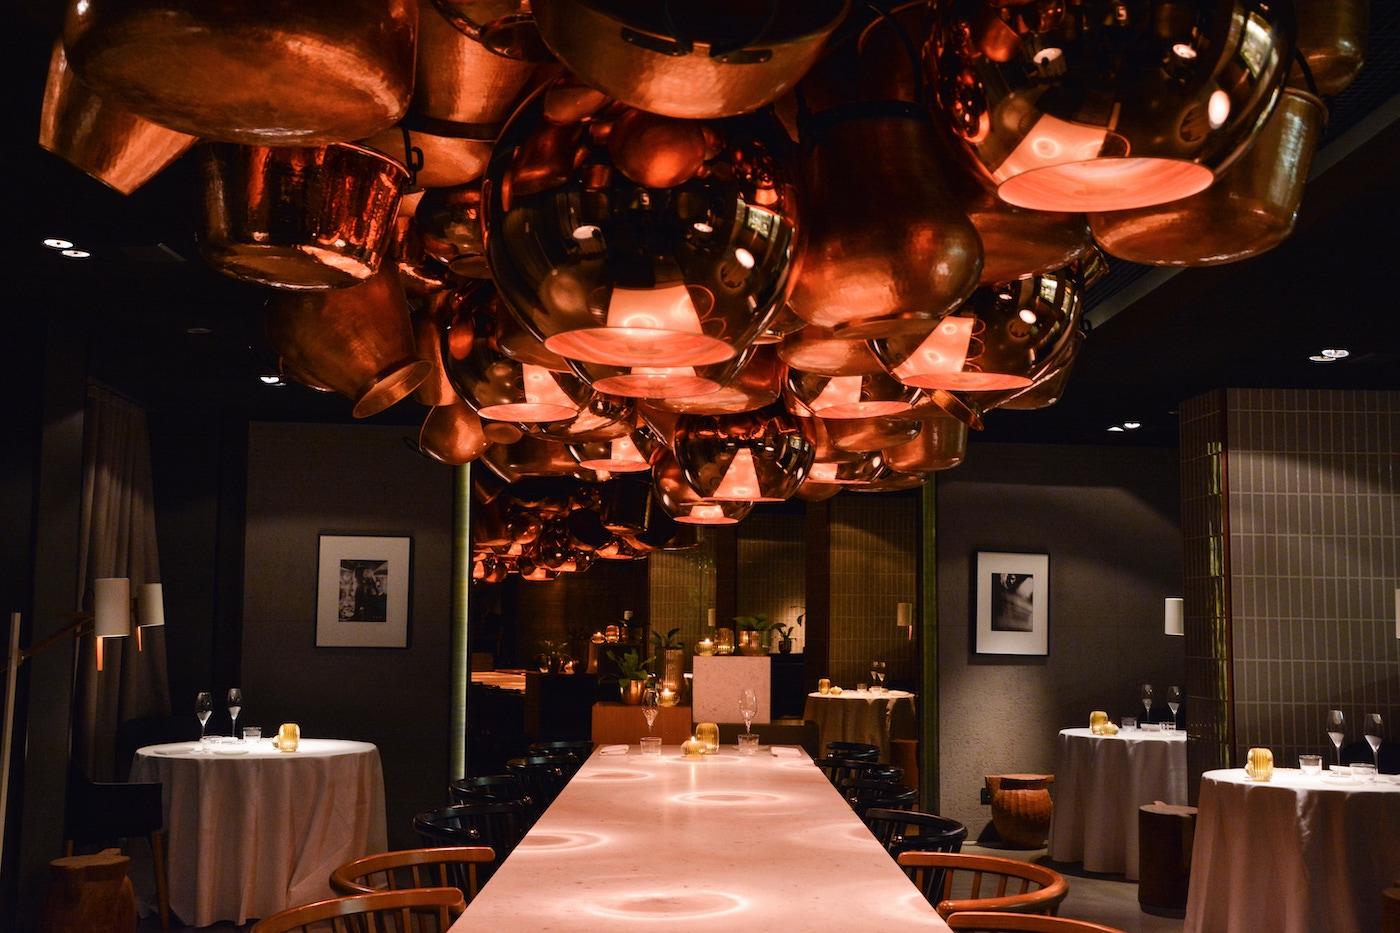 tooktook-photography-gastronomy-food-beverages-experiences-restaurants-146.jpg